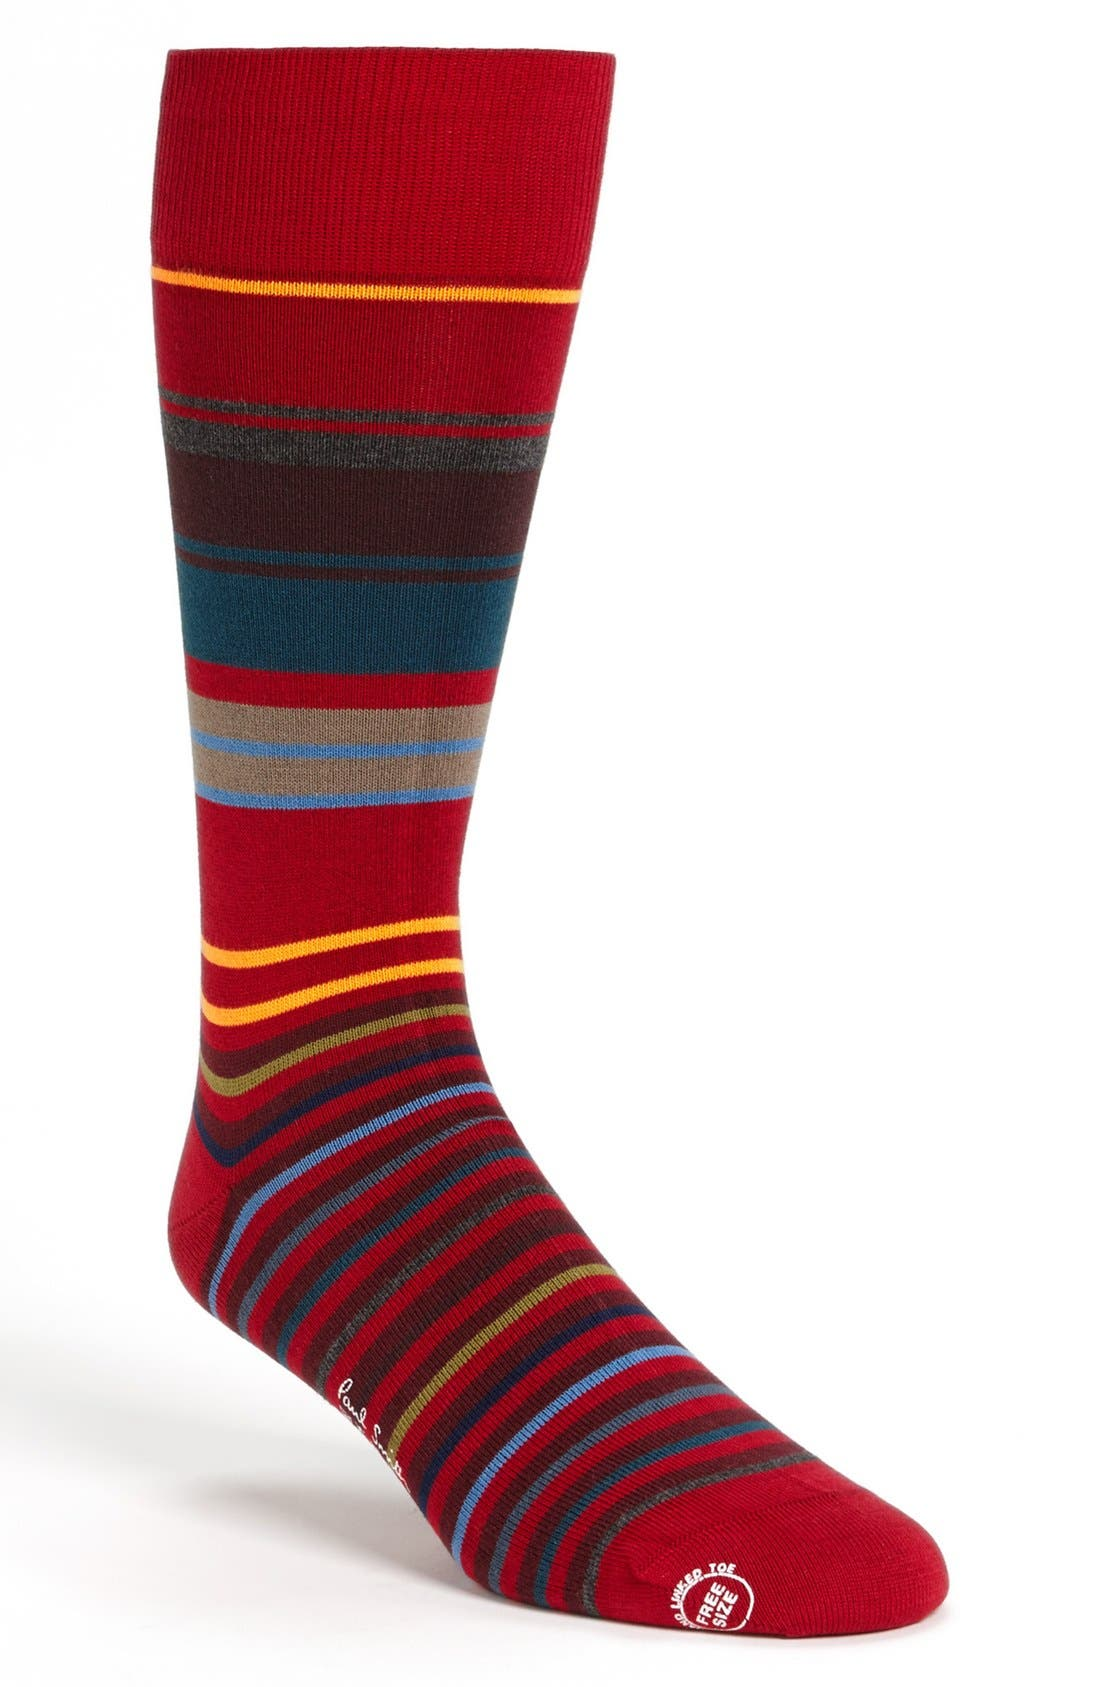 Alternate Image 1 Selected - Paul Smith Accessories Neon Stripe Socks